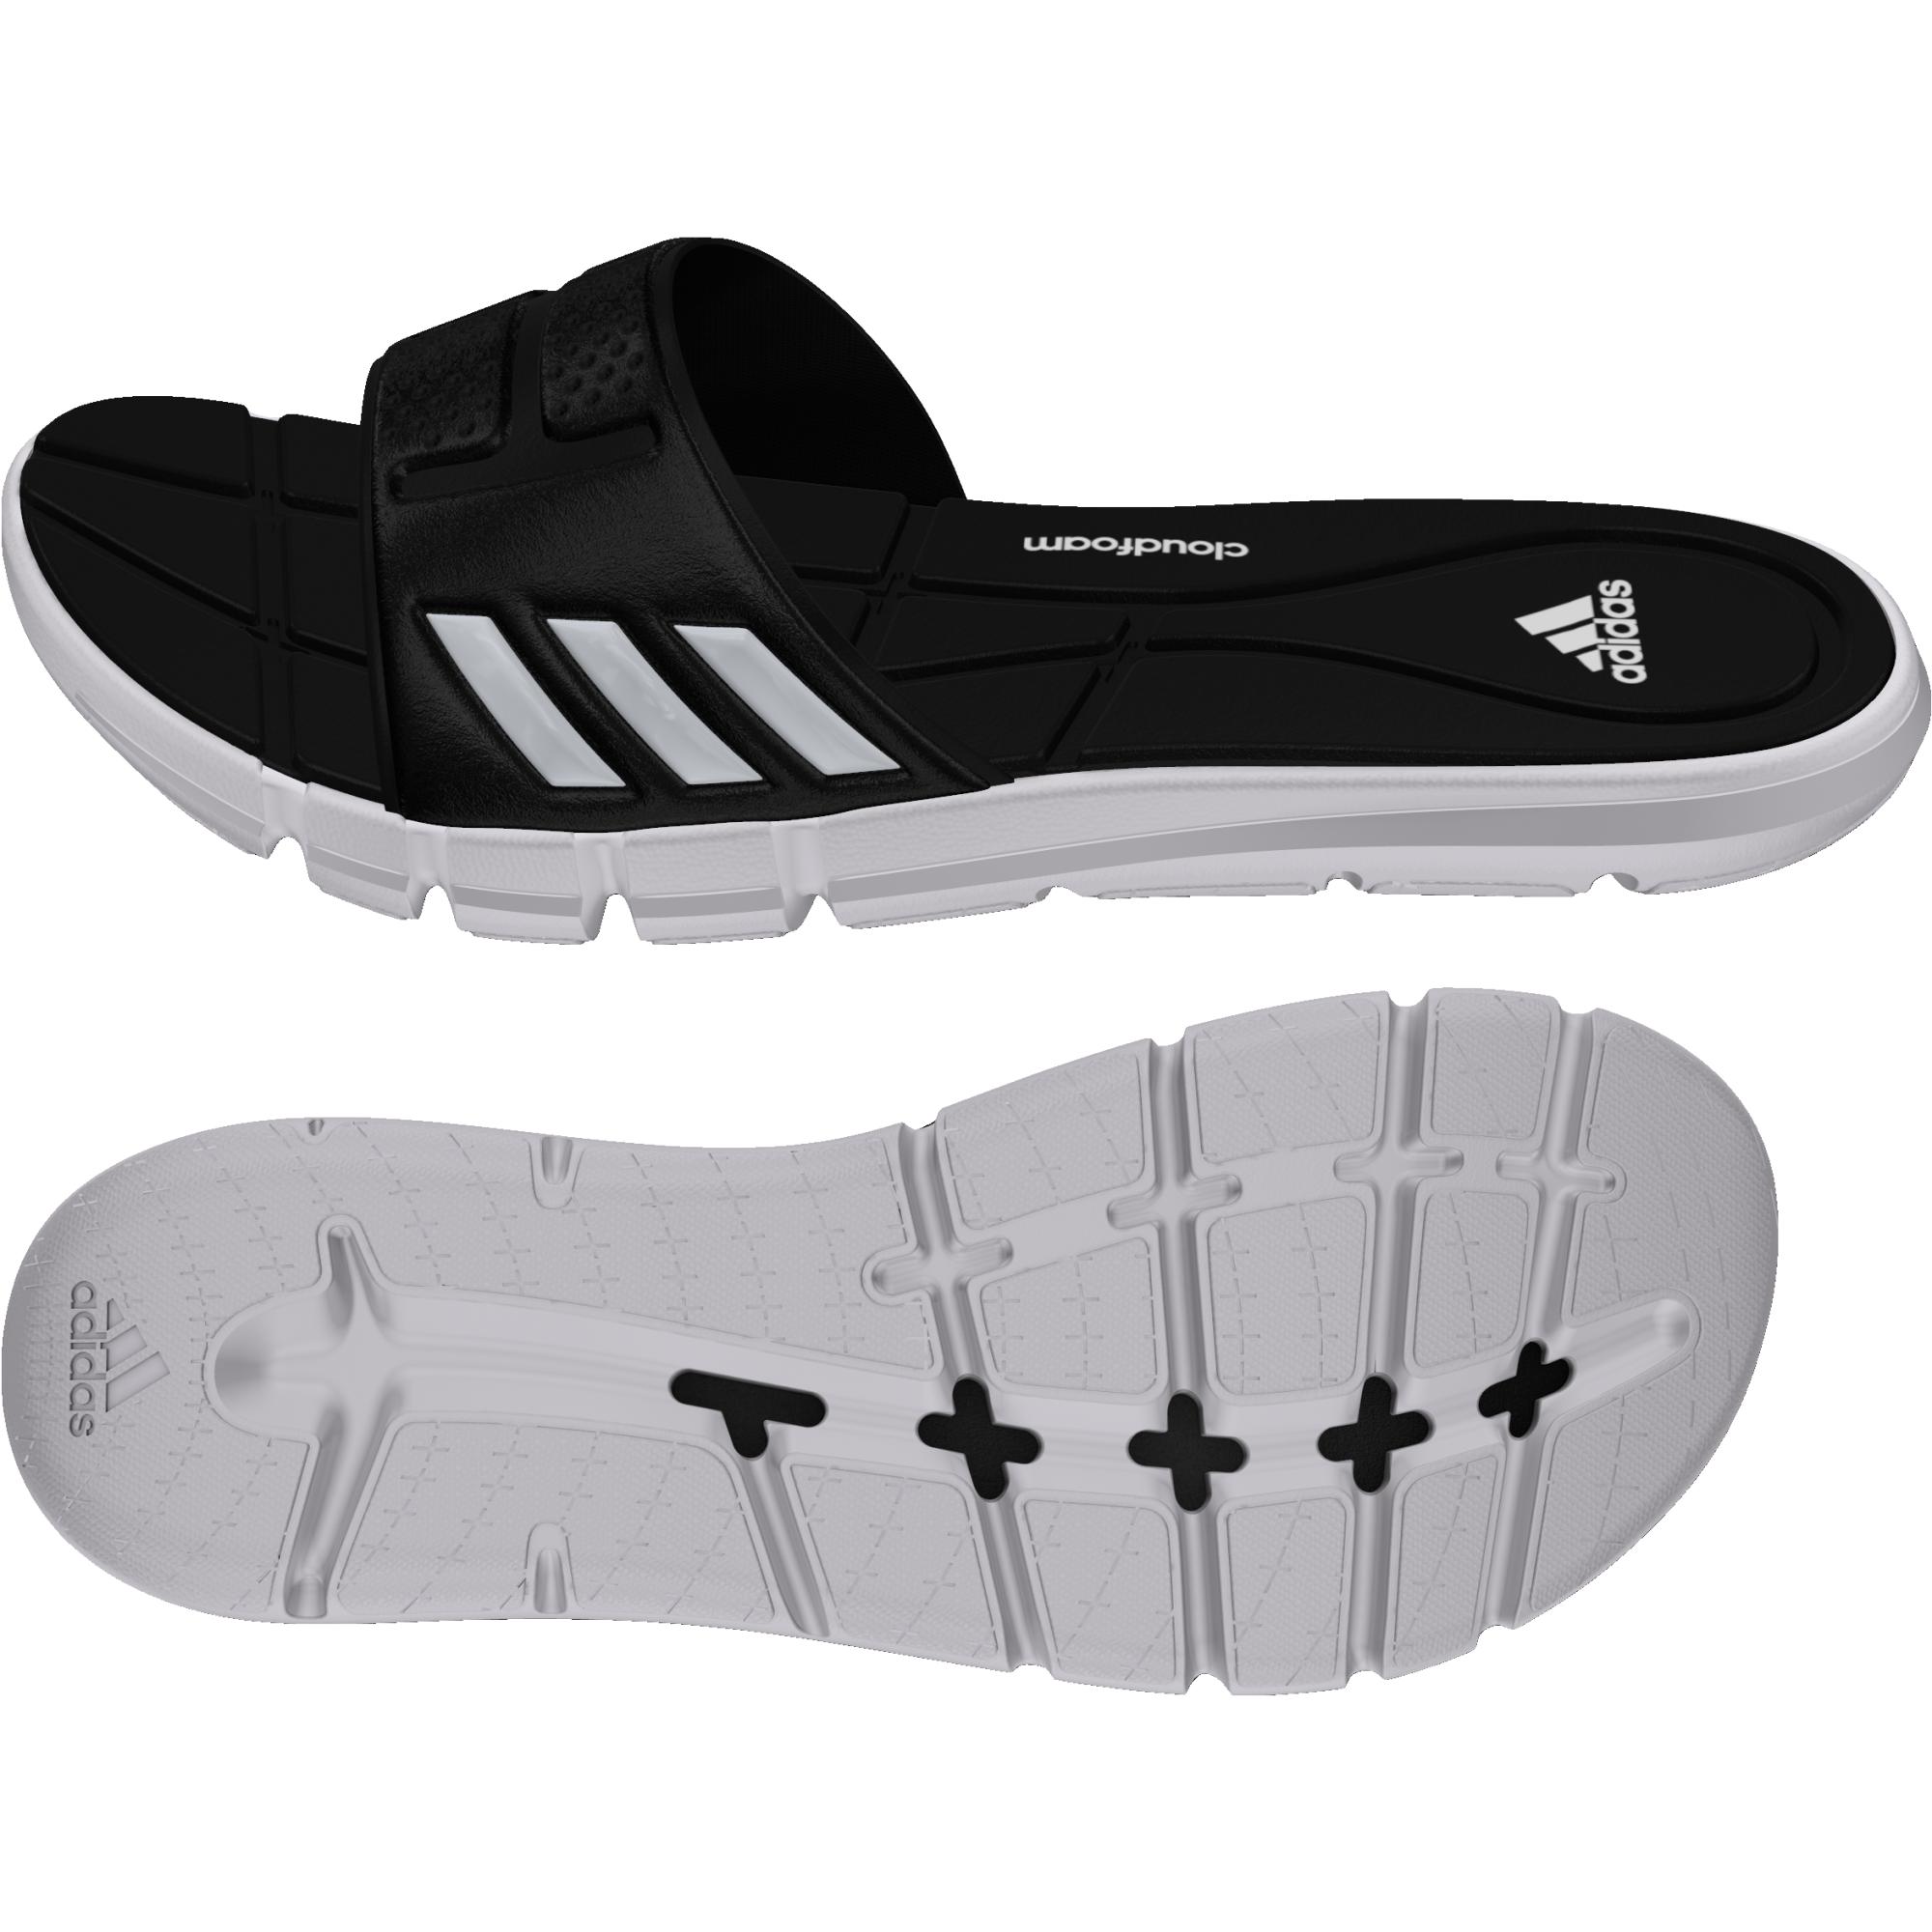 Adidas Adipure CF W női papucs  aec7d58e5e